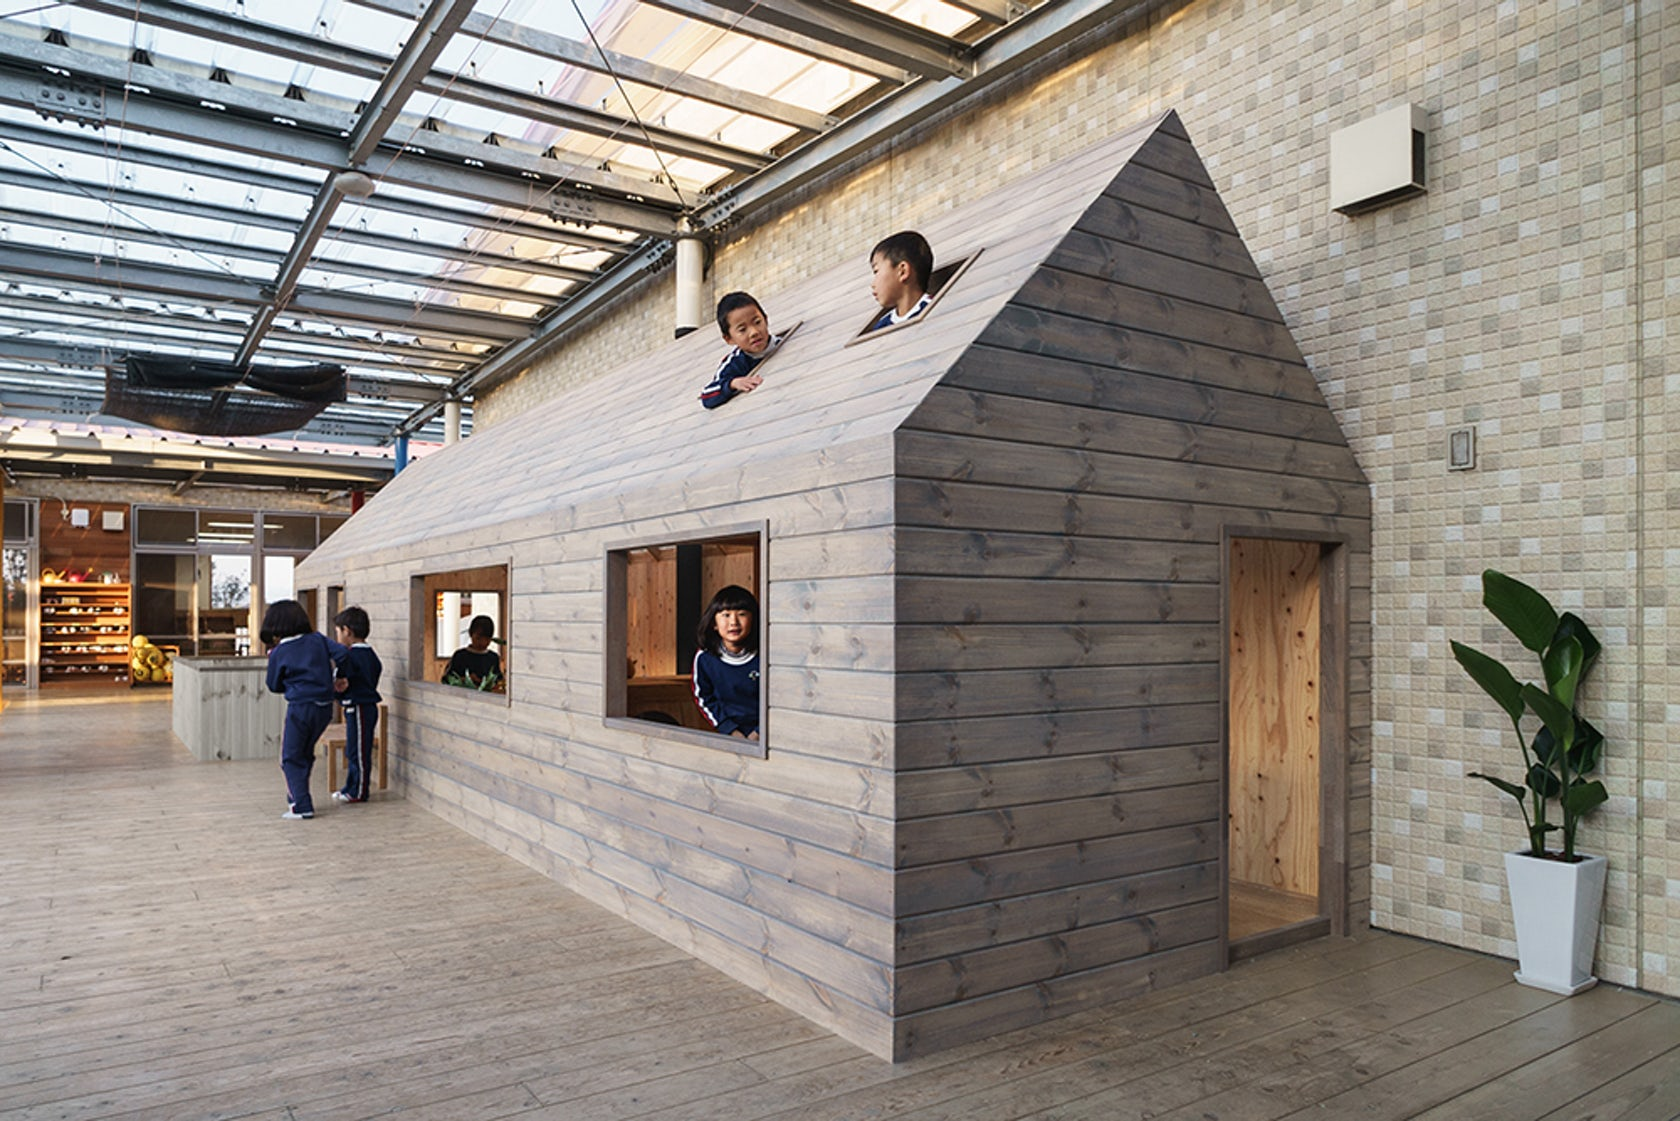 Hibinosekkei youji no shiro architizer for Tiny house architects